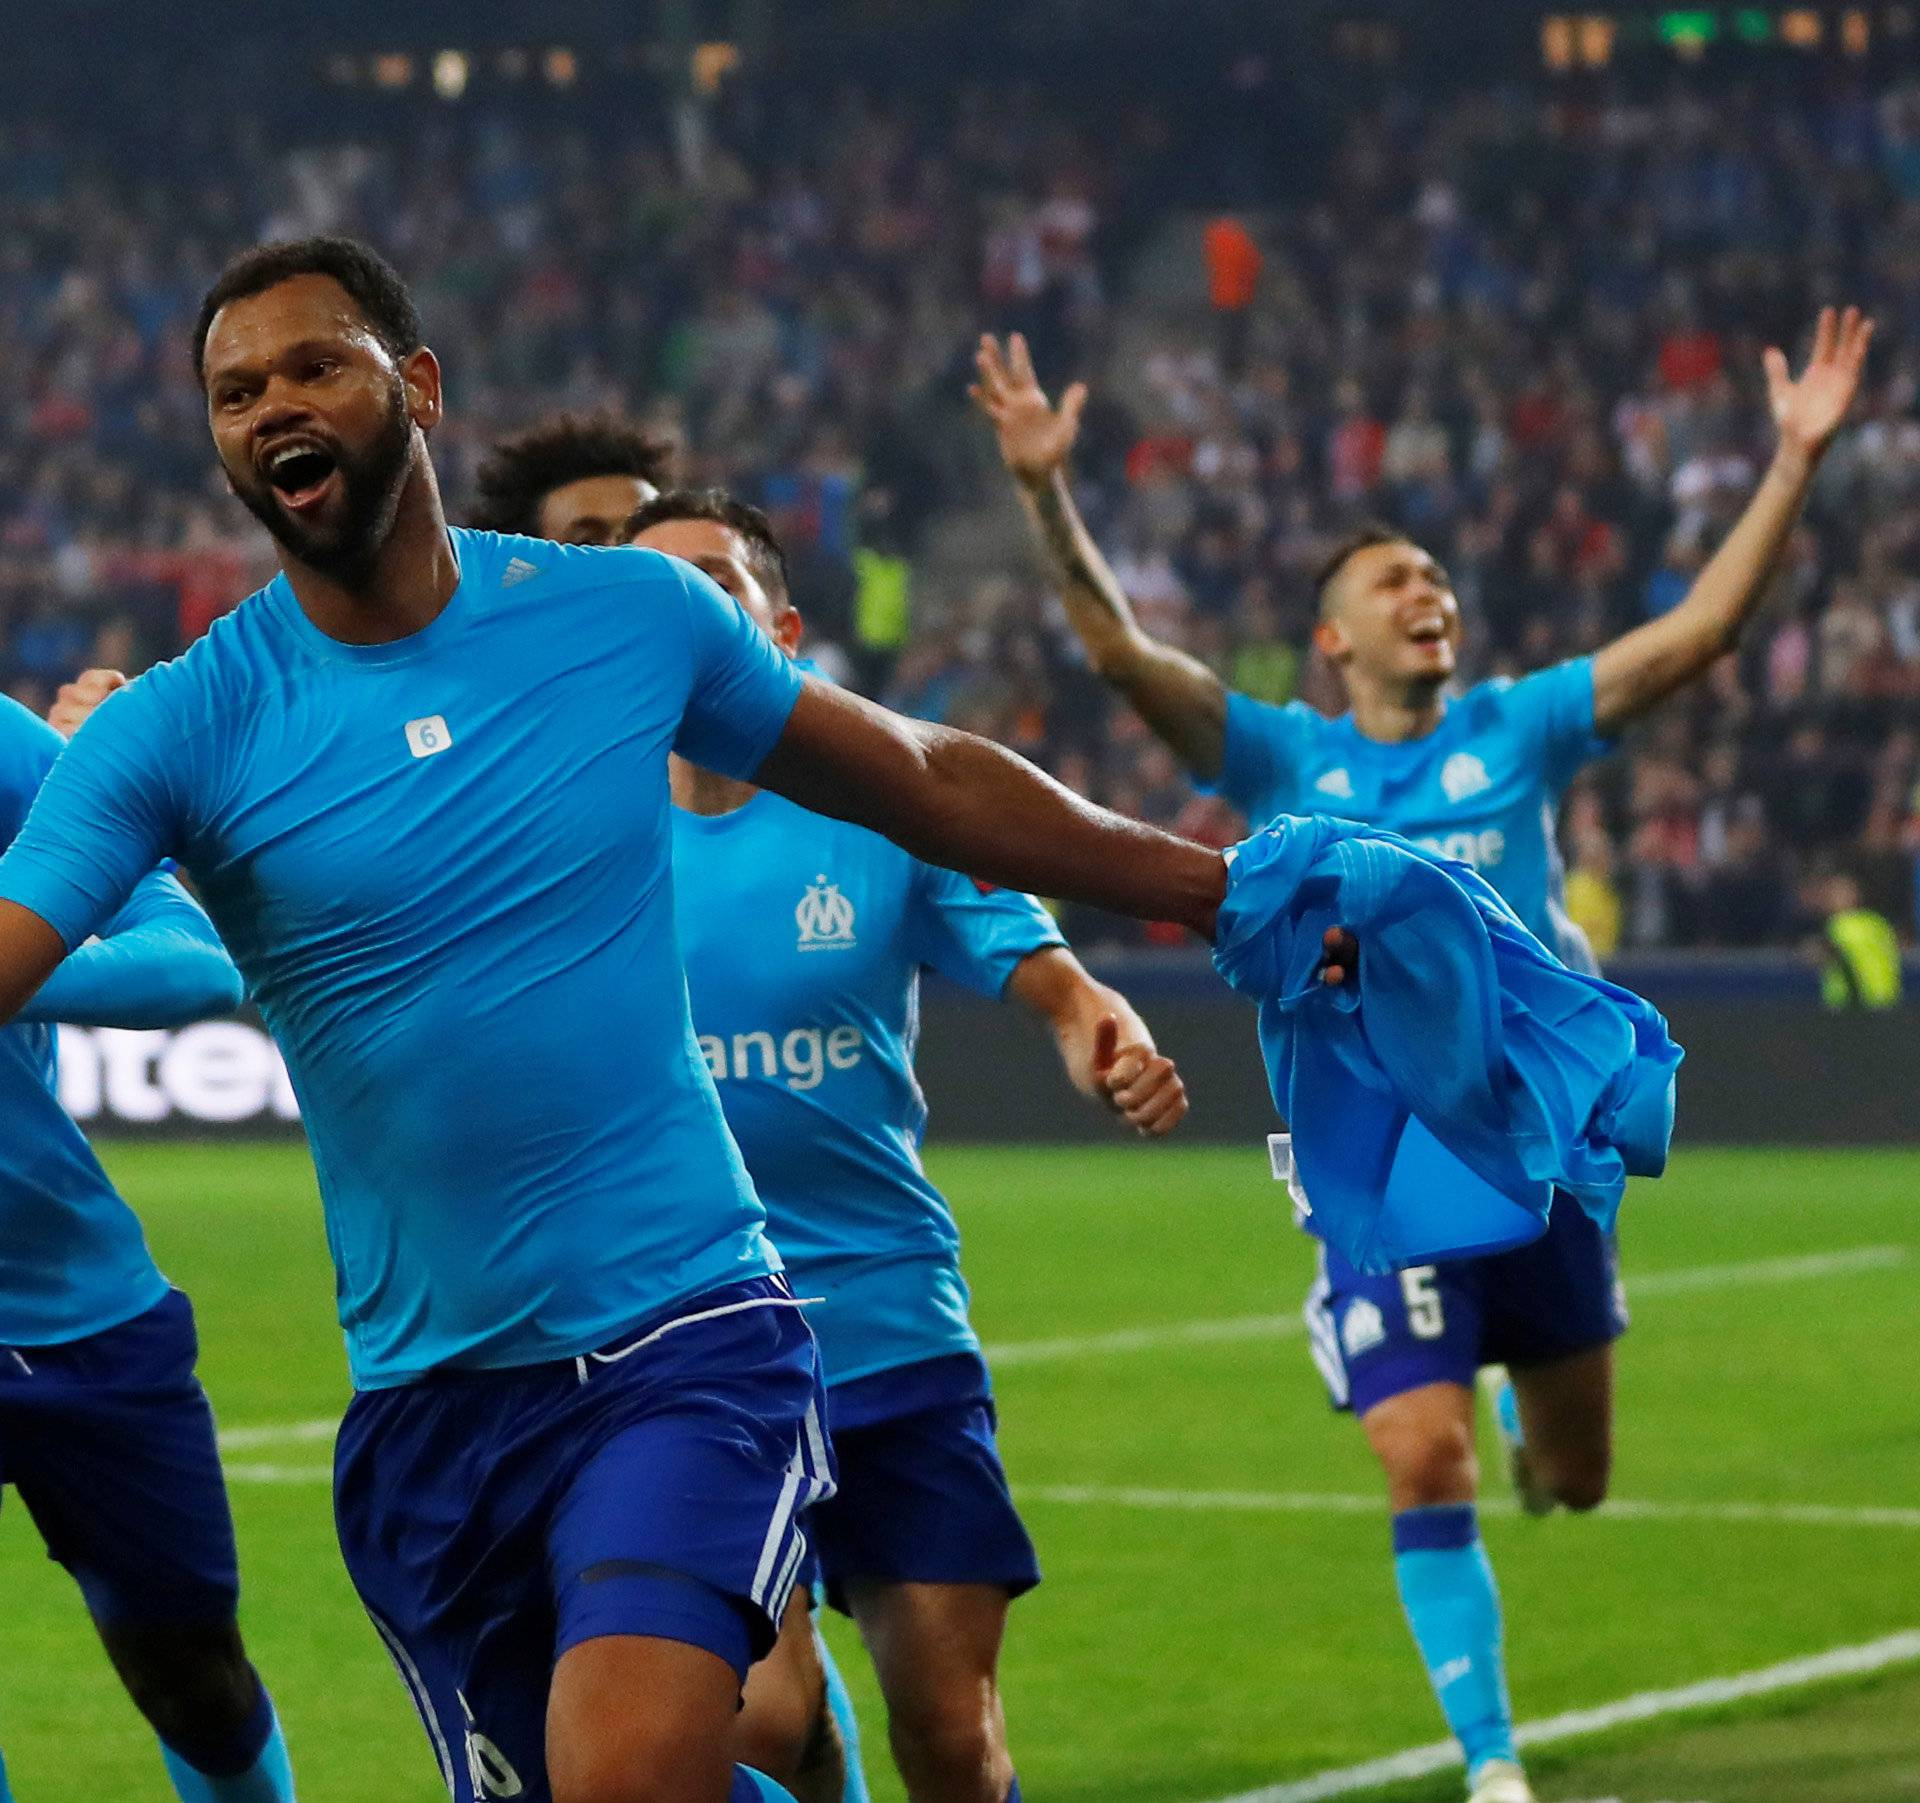 Europa League Semi Final Second Leg - RB Salzburg v Olympique de Marseille